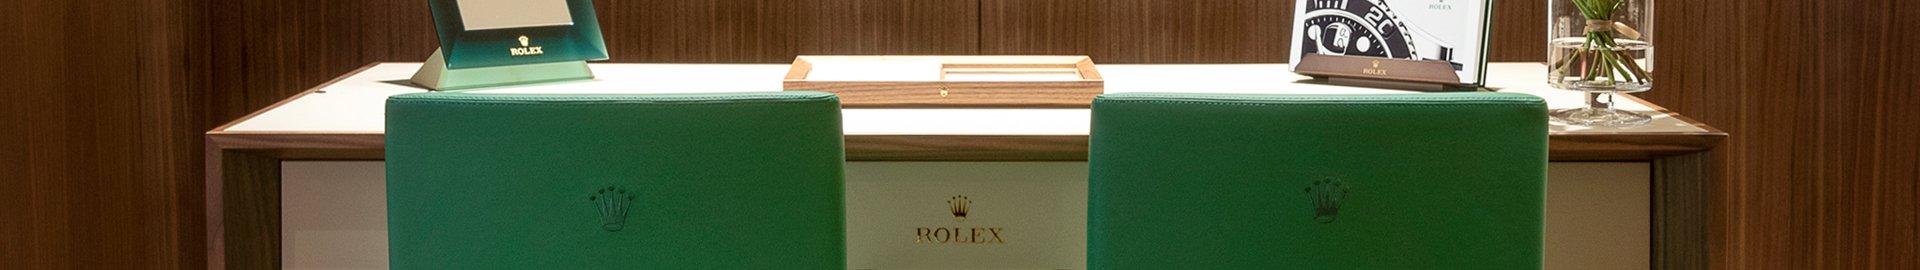 Rolex by Prestons, Leeds